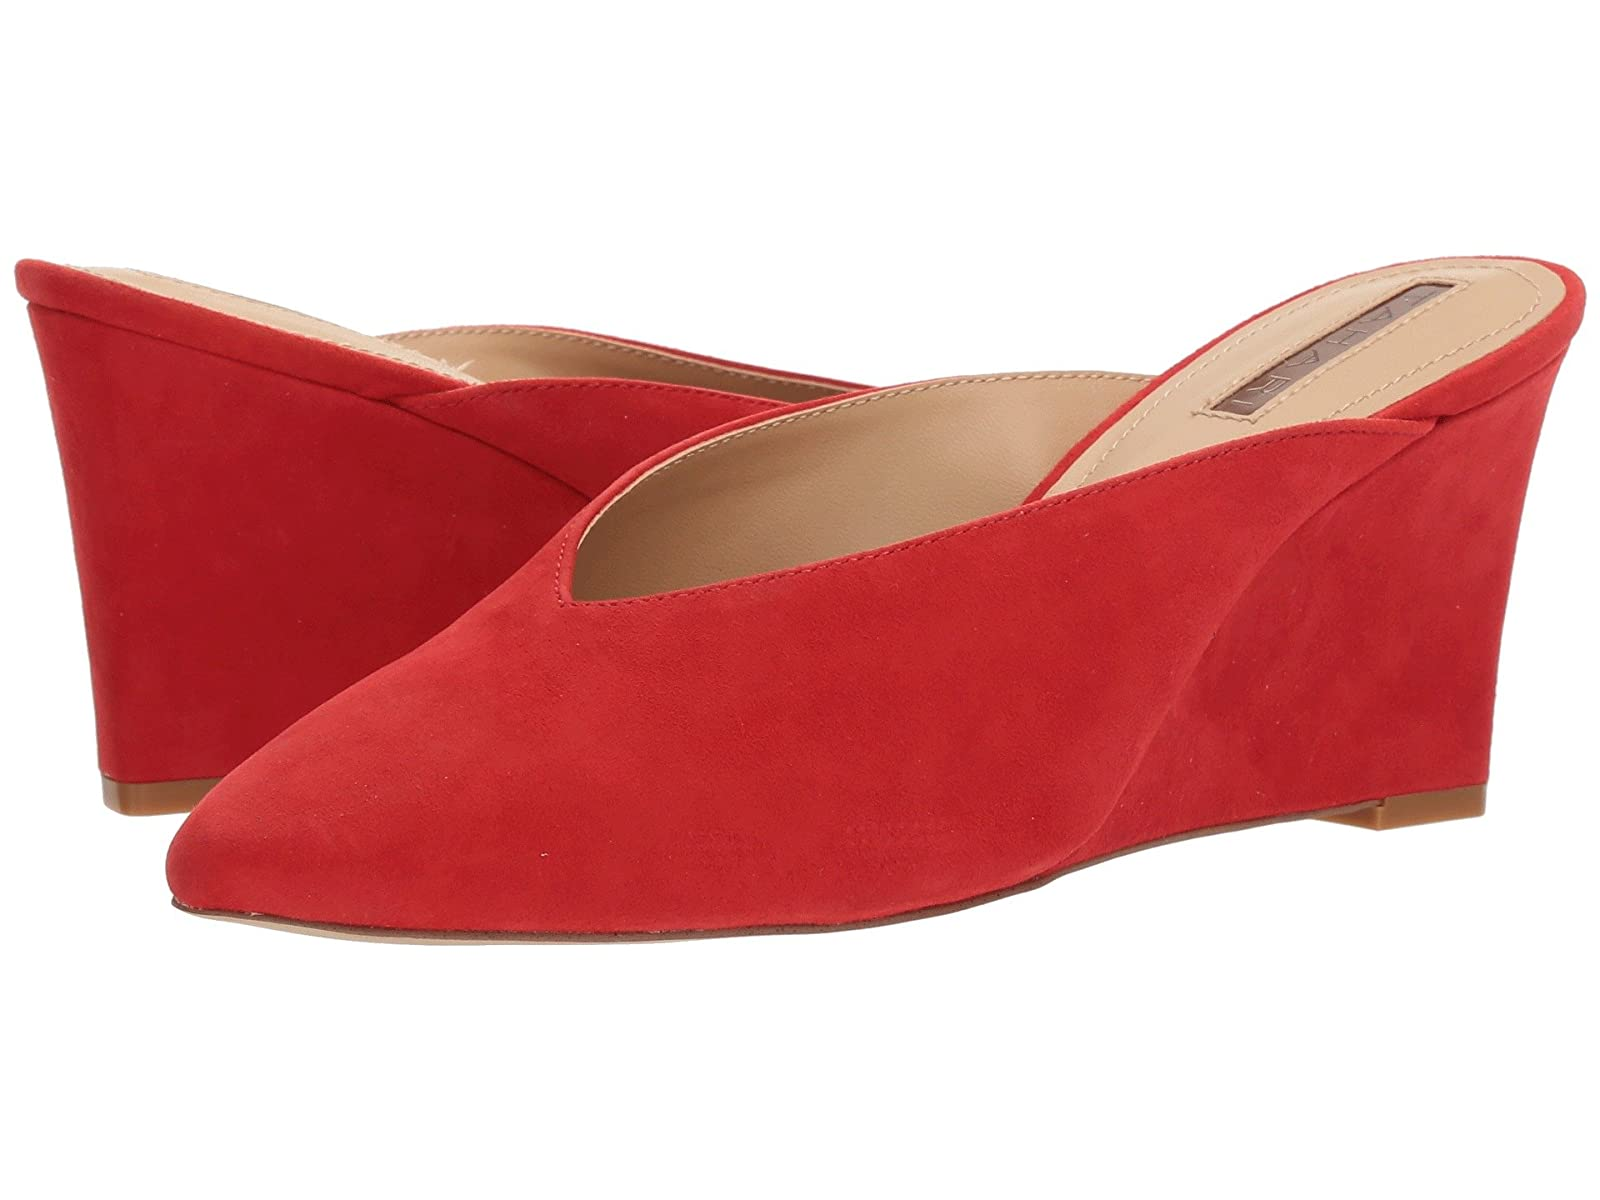 Tahari WestonCheap and distinctive eye-catching shoes